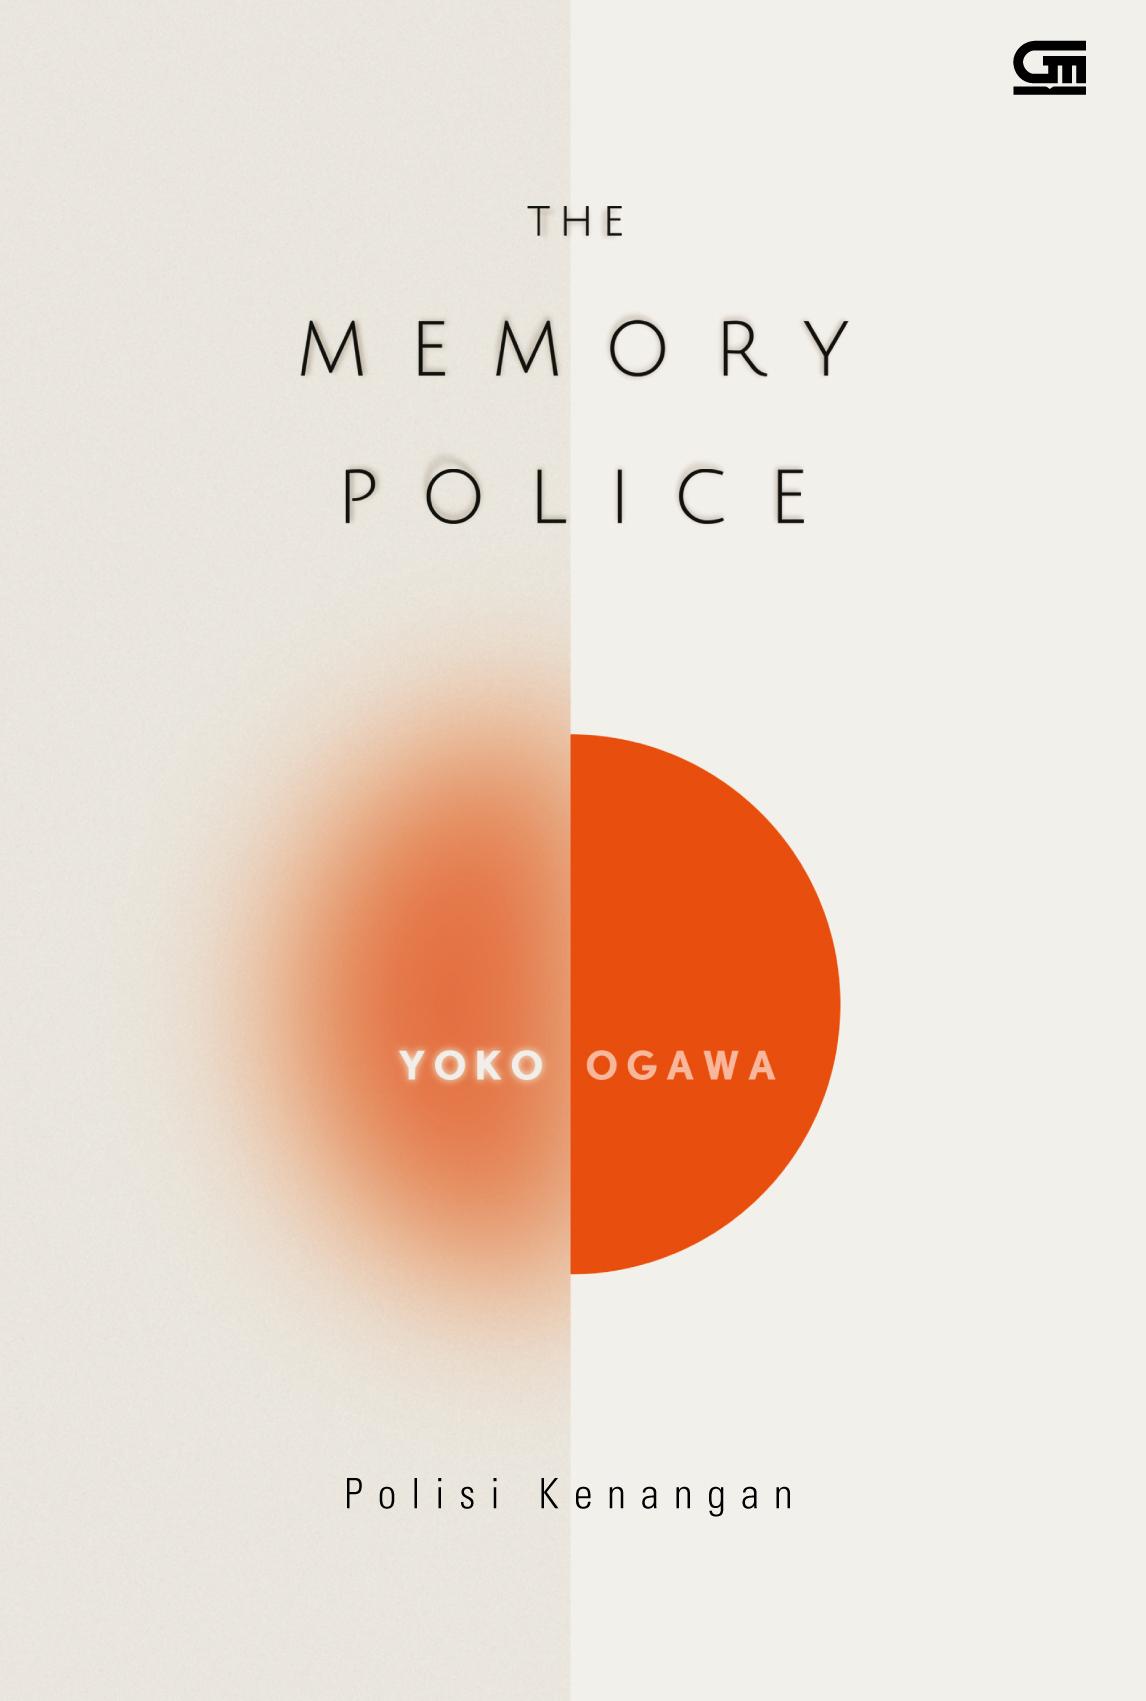 Polisi Kenangan (The Memory Police)